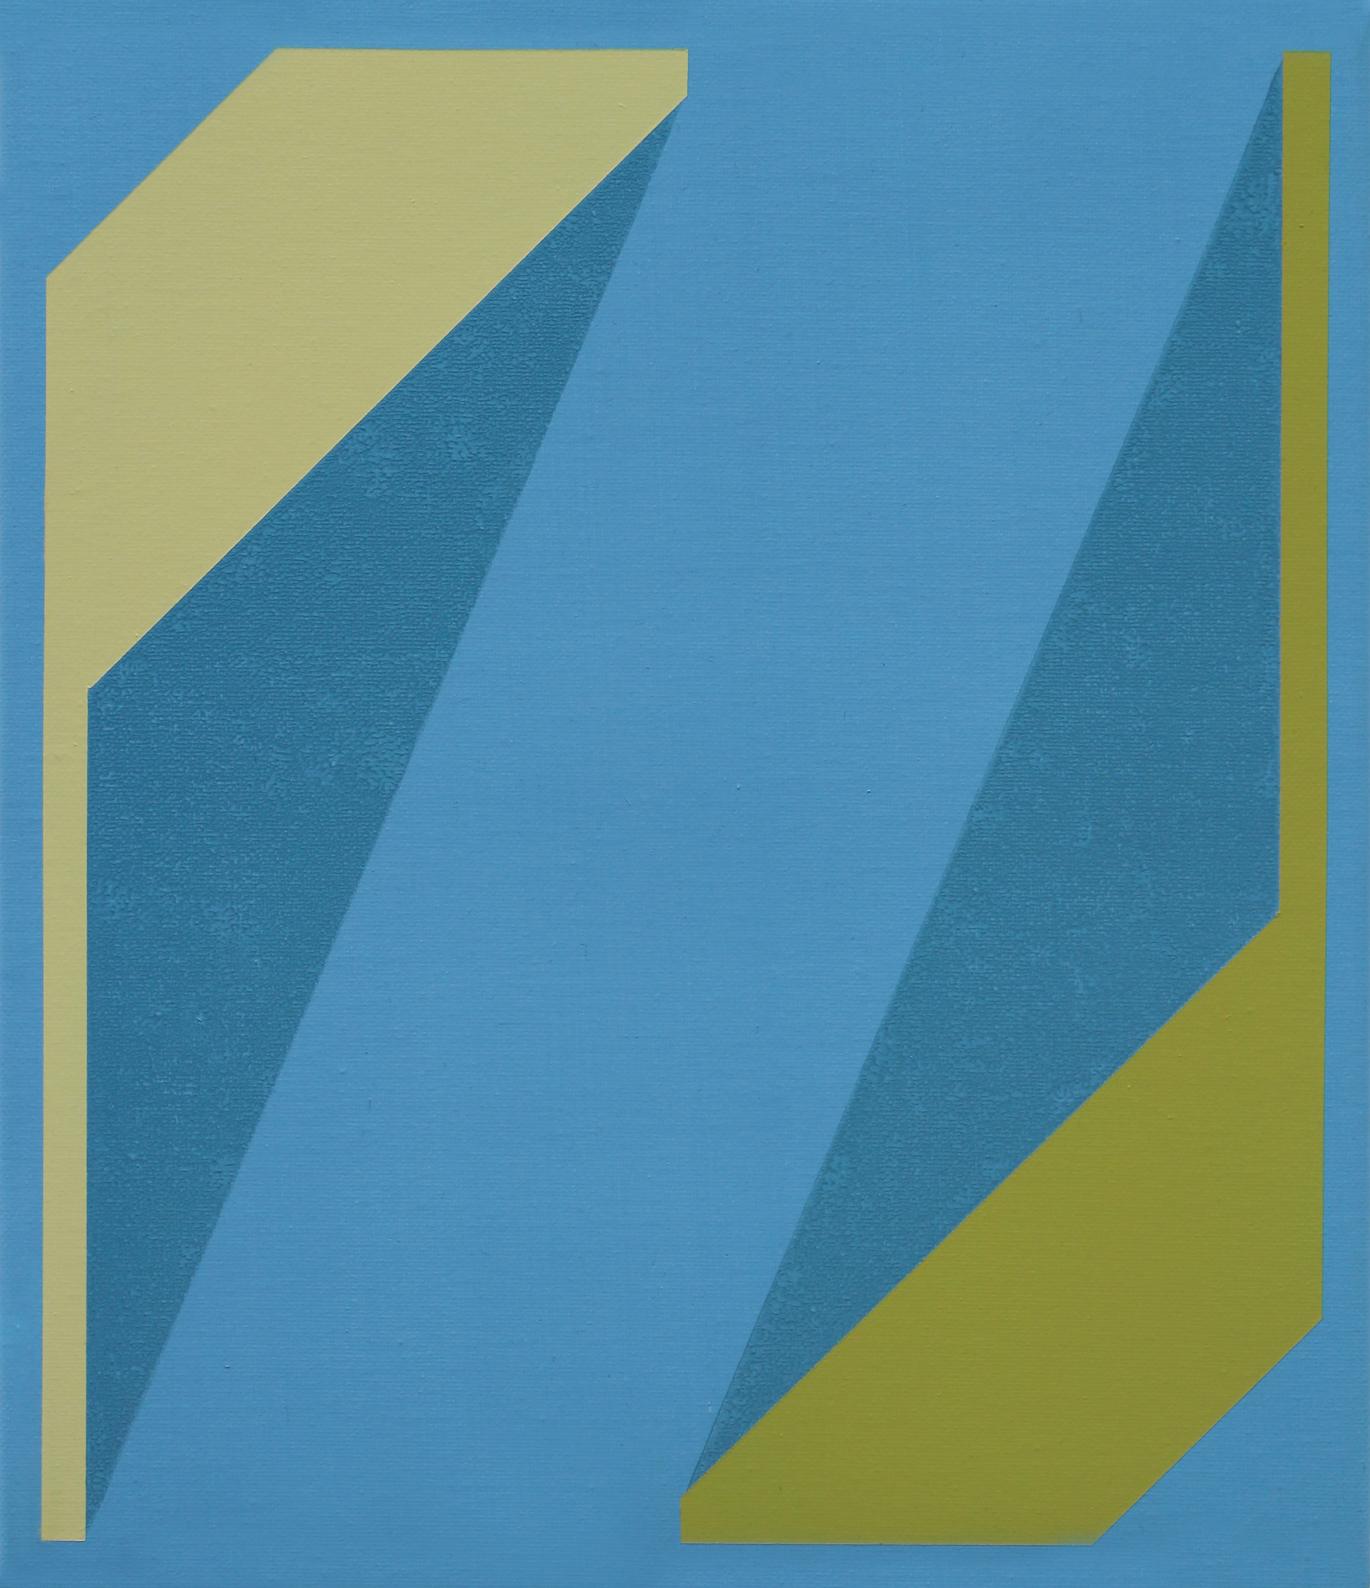 Untitled (Blue Green Mustard)